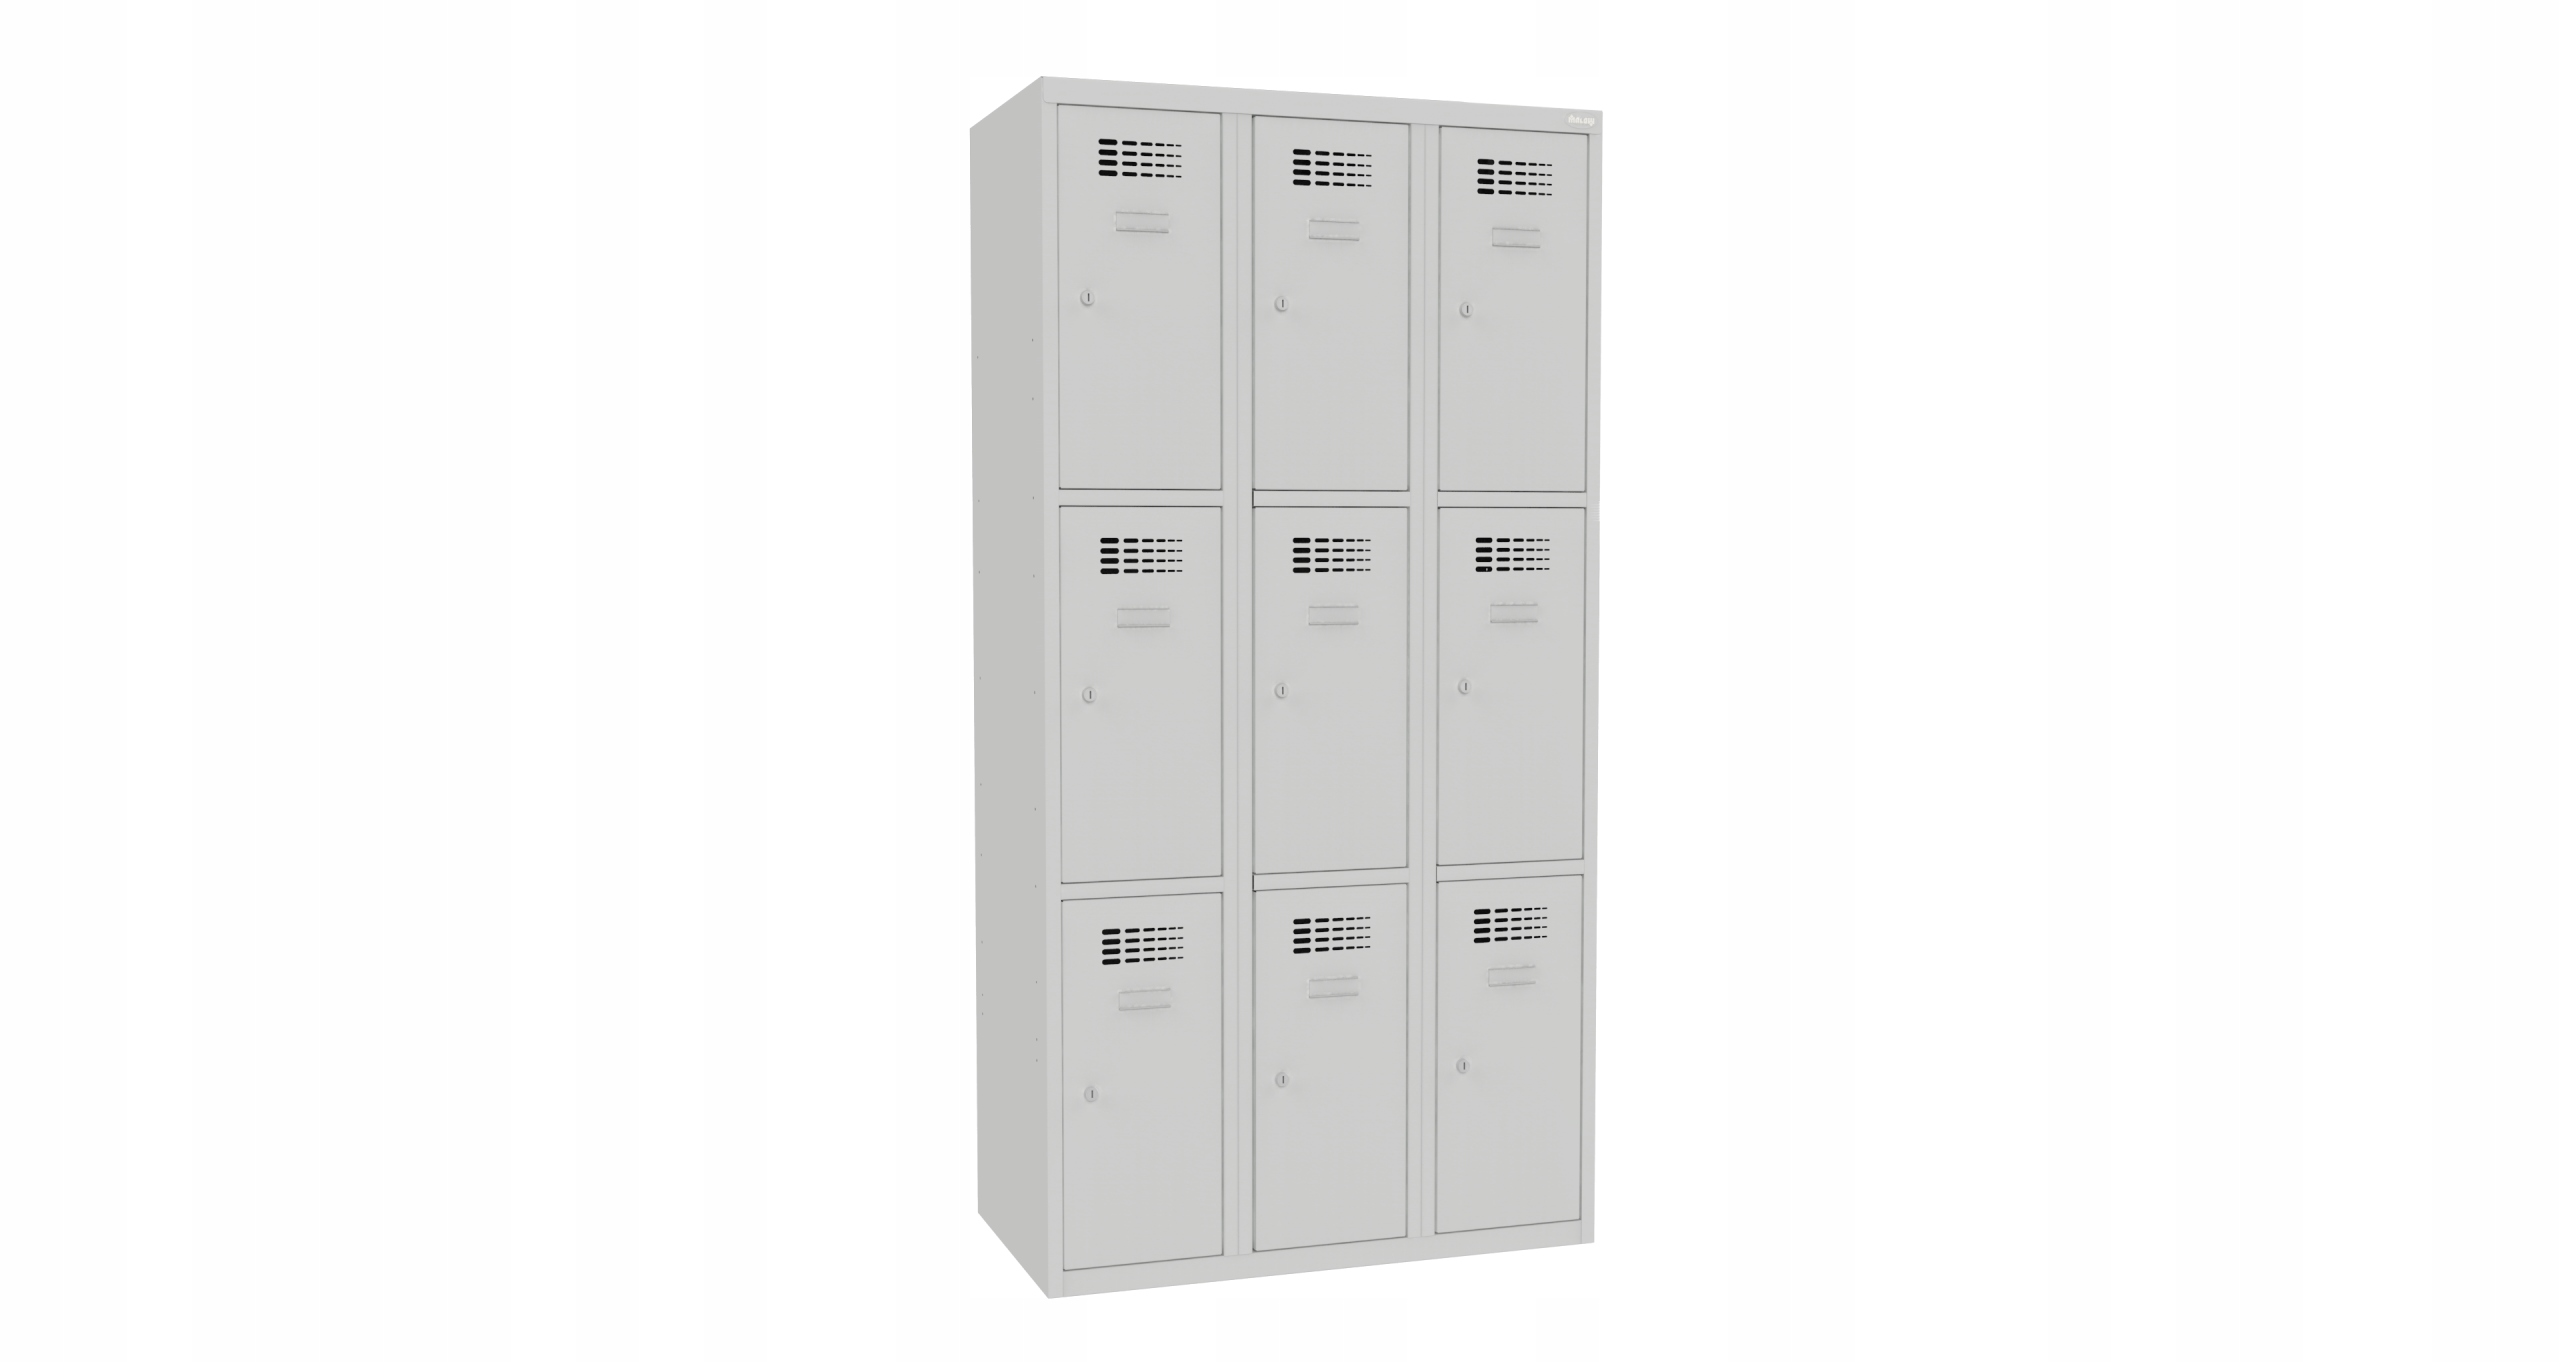 шкаф шкаф 9 skrytkowa для Школа Магазин